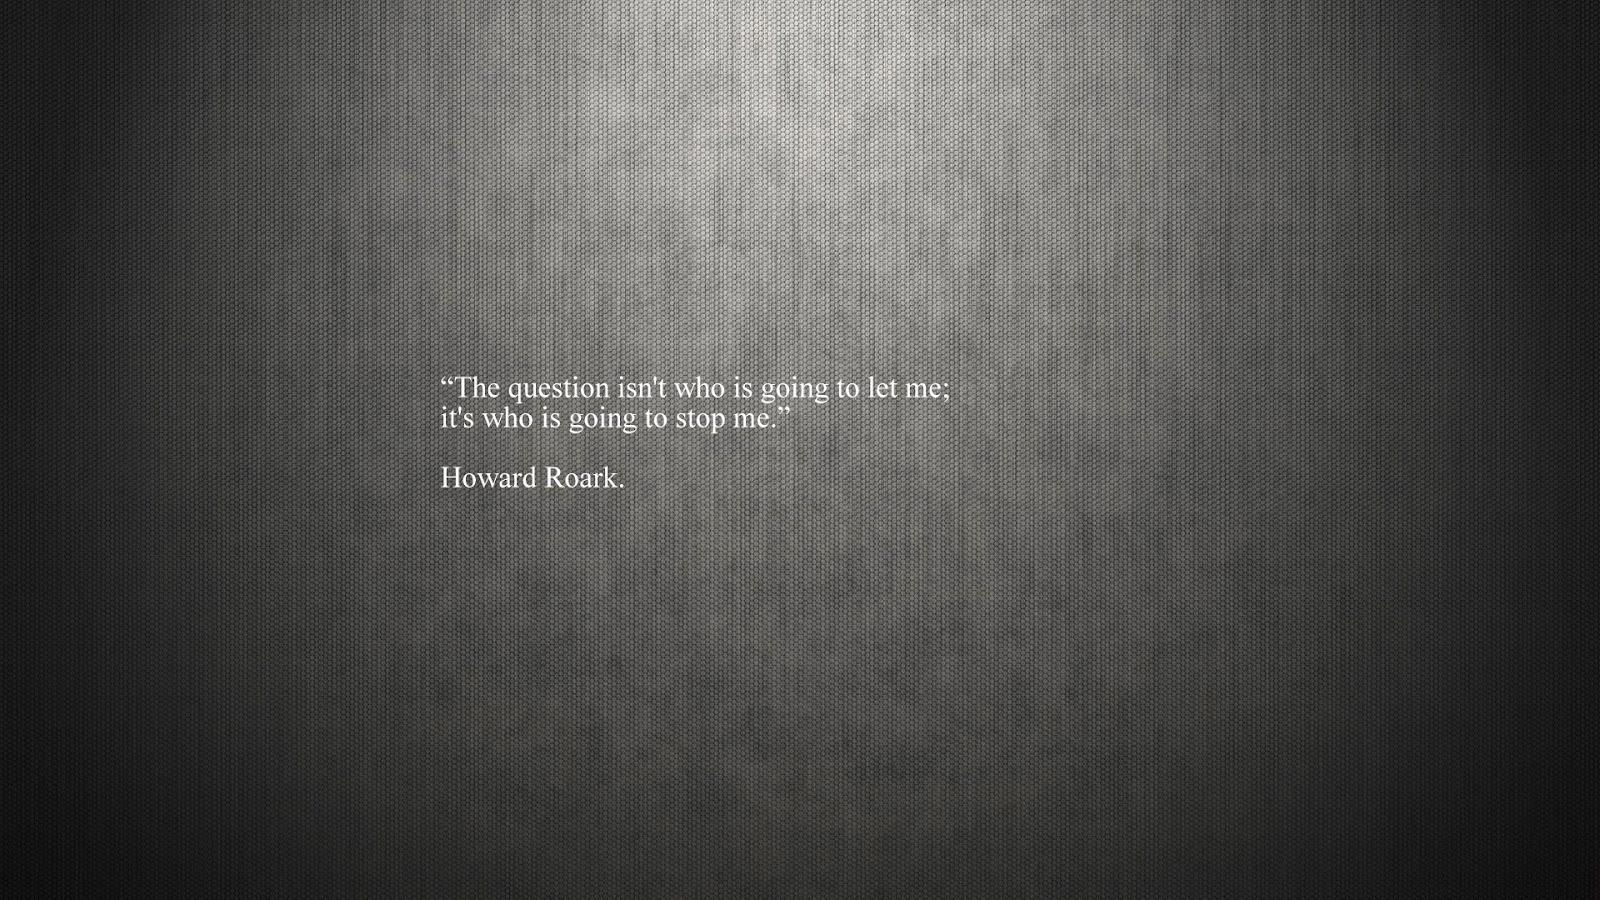 Howard Roark Quotes. QuotesGram